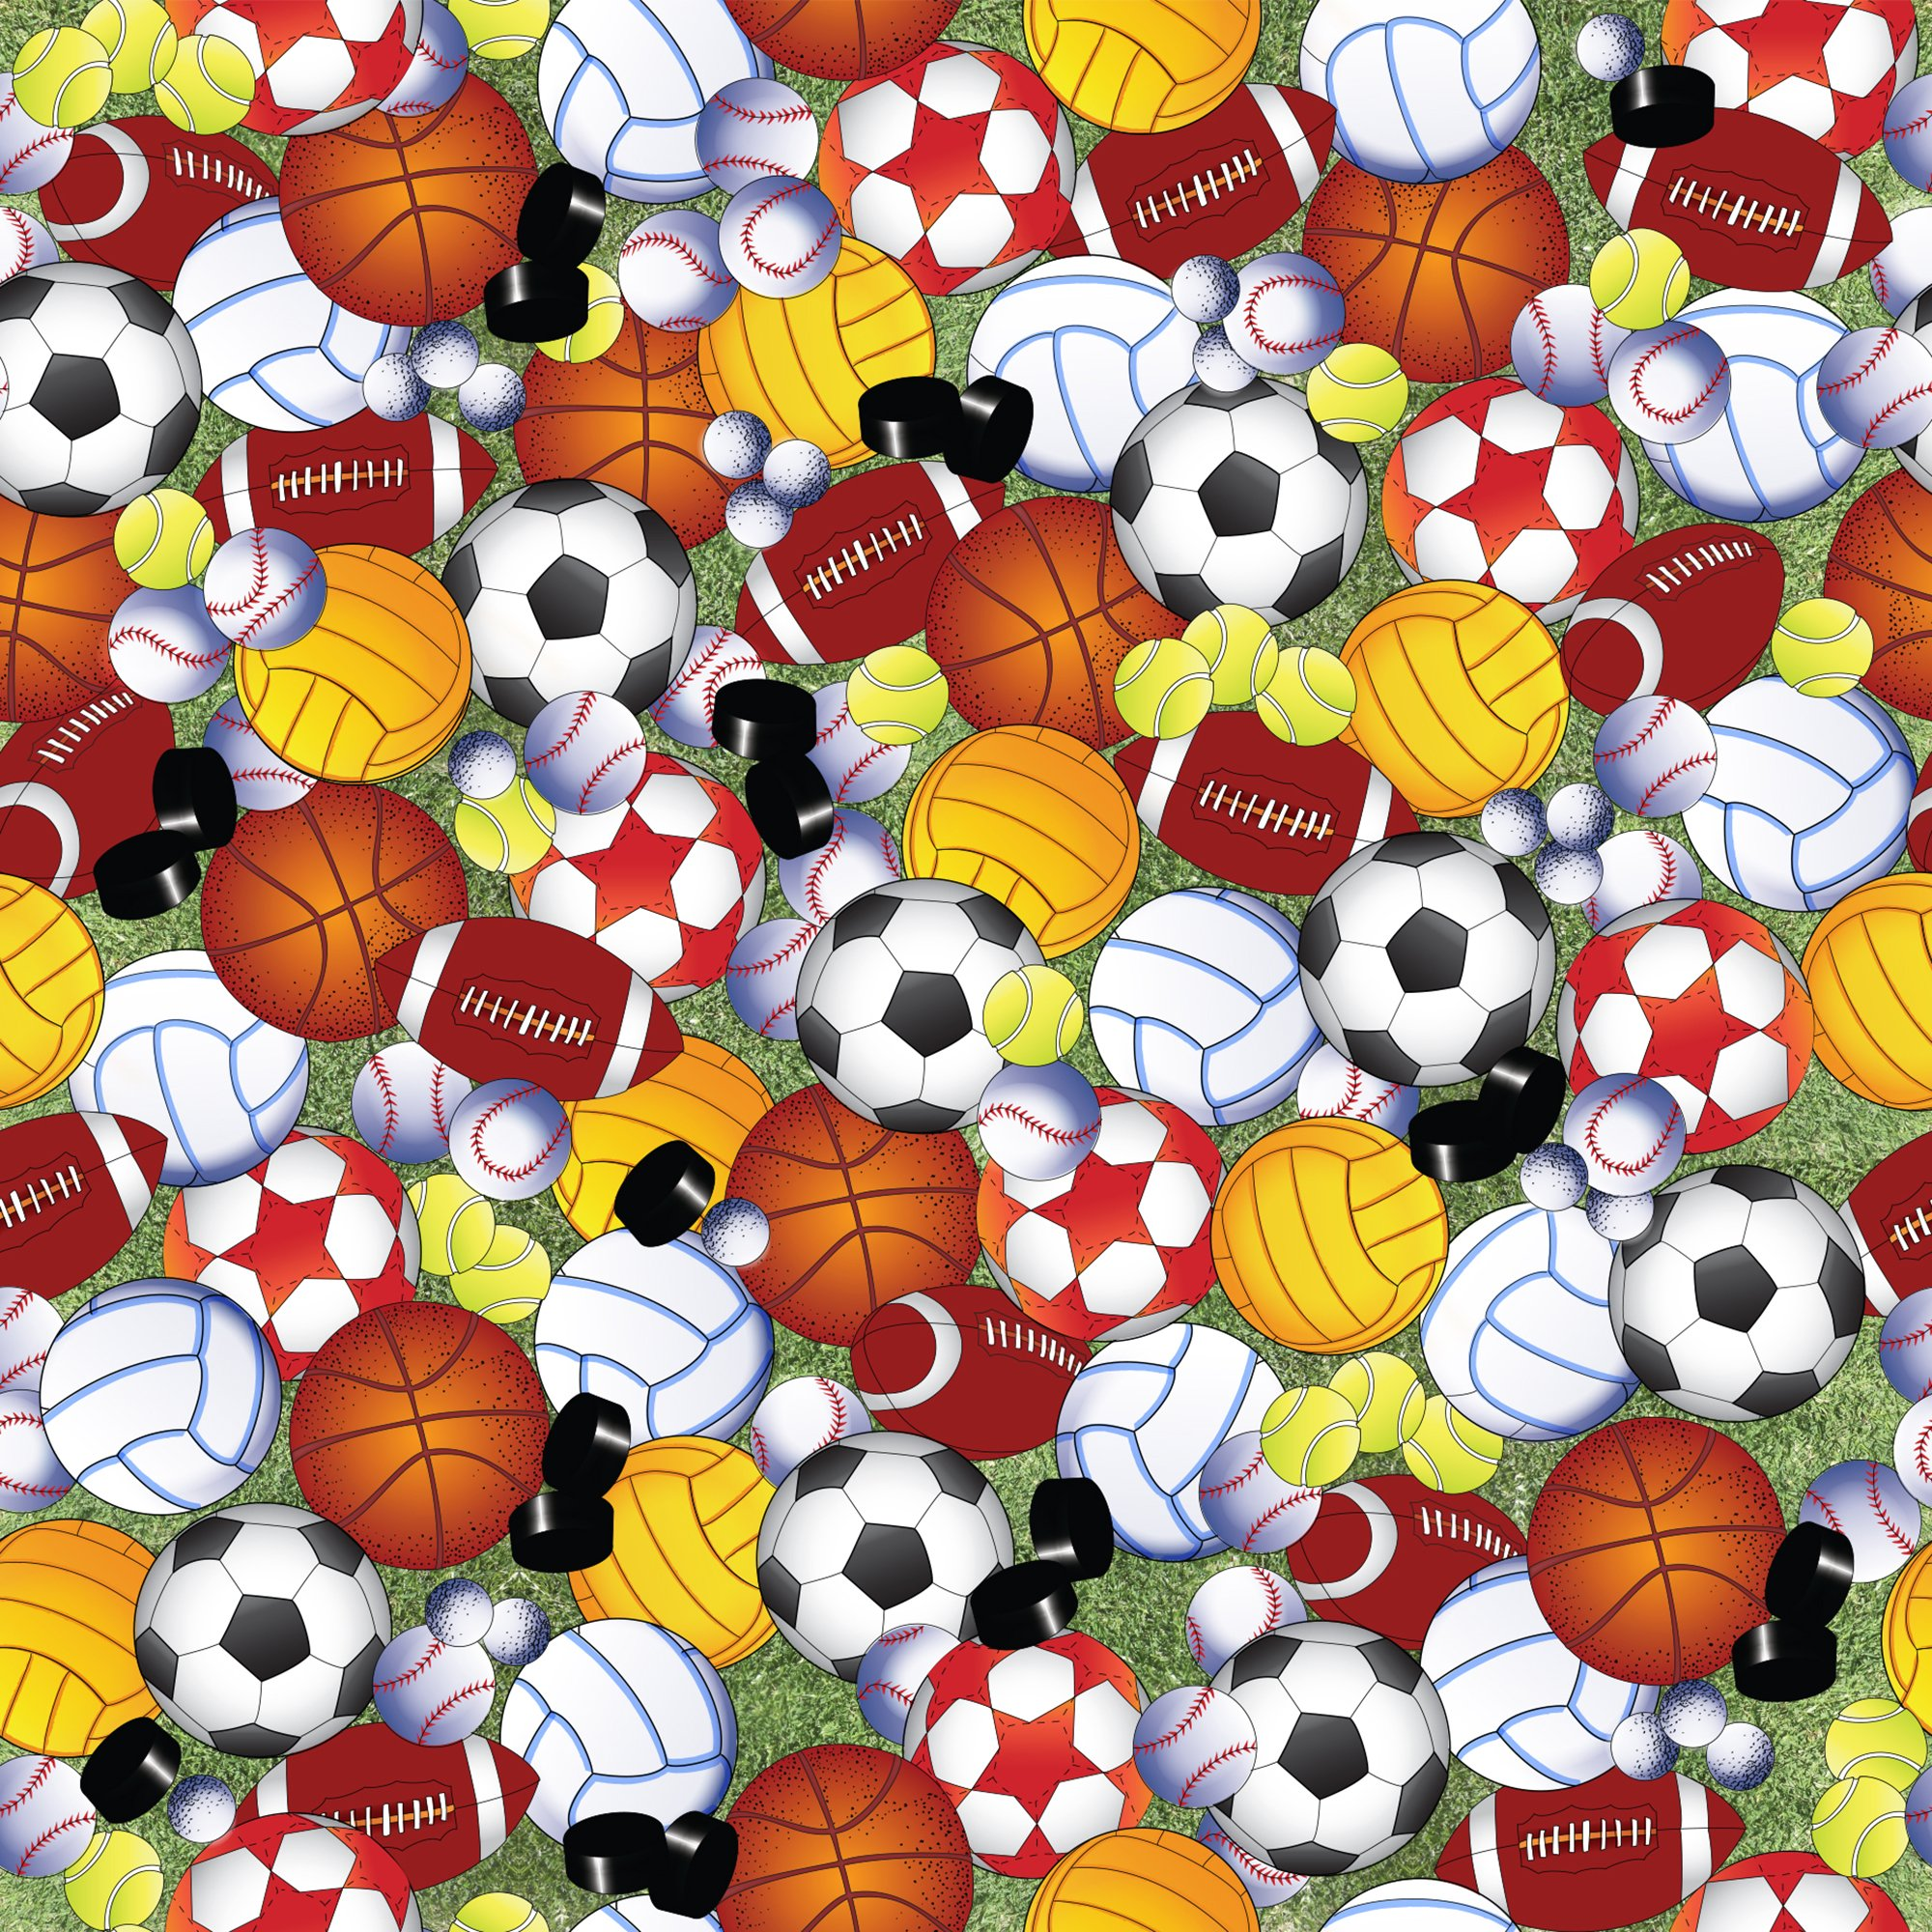 Jillson & Roberts Gift Wrap, Play Ball (8 Rolls 5ft x 30in)